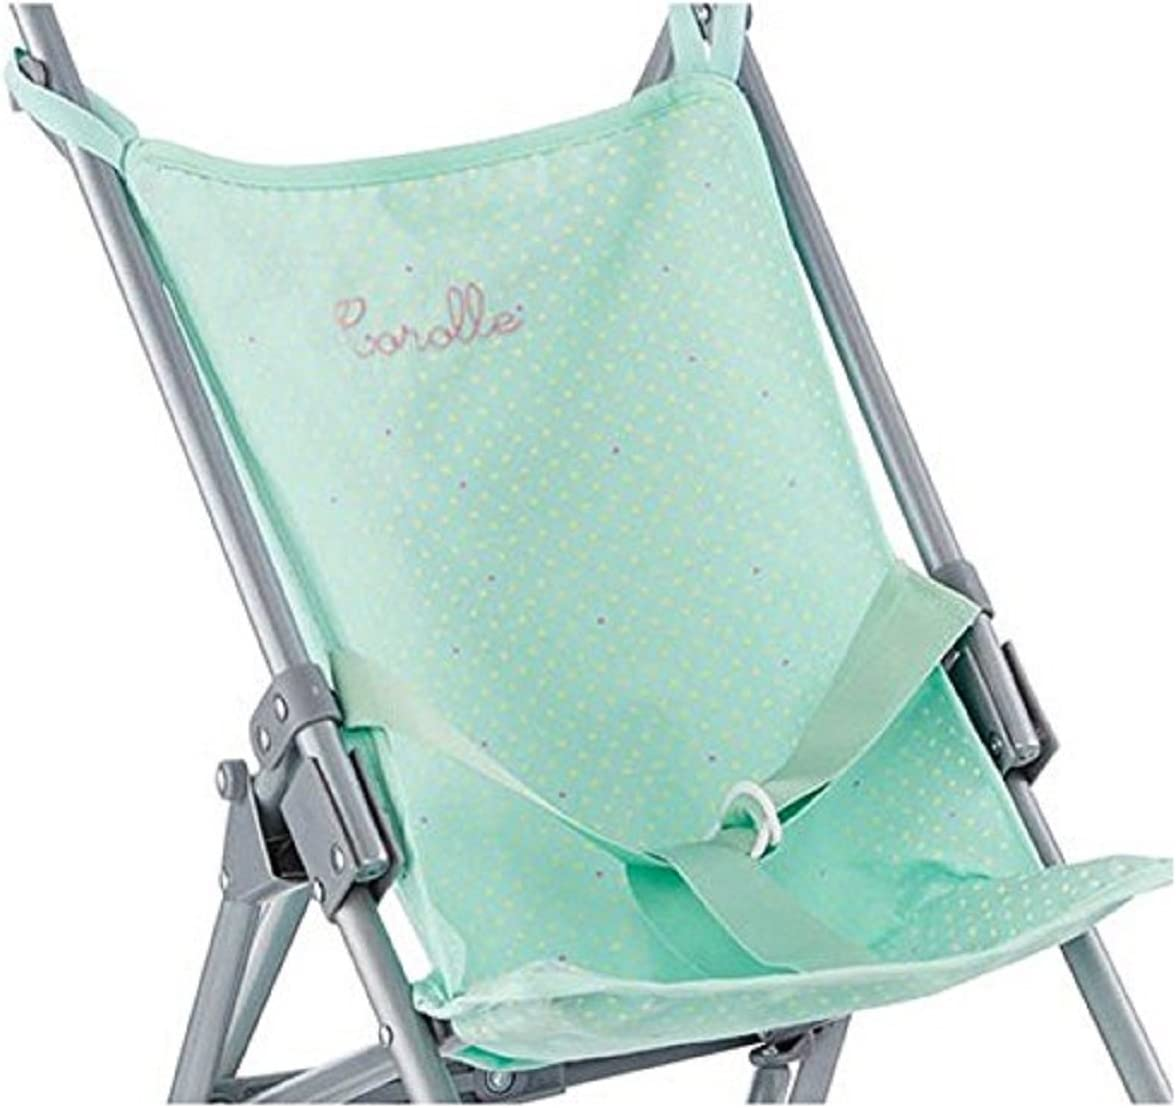 Corolle Umbrella Seat Cover for Mon Classique Umbrella Strollers (Colors Vary)